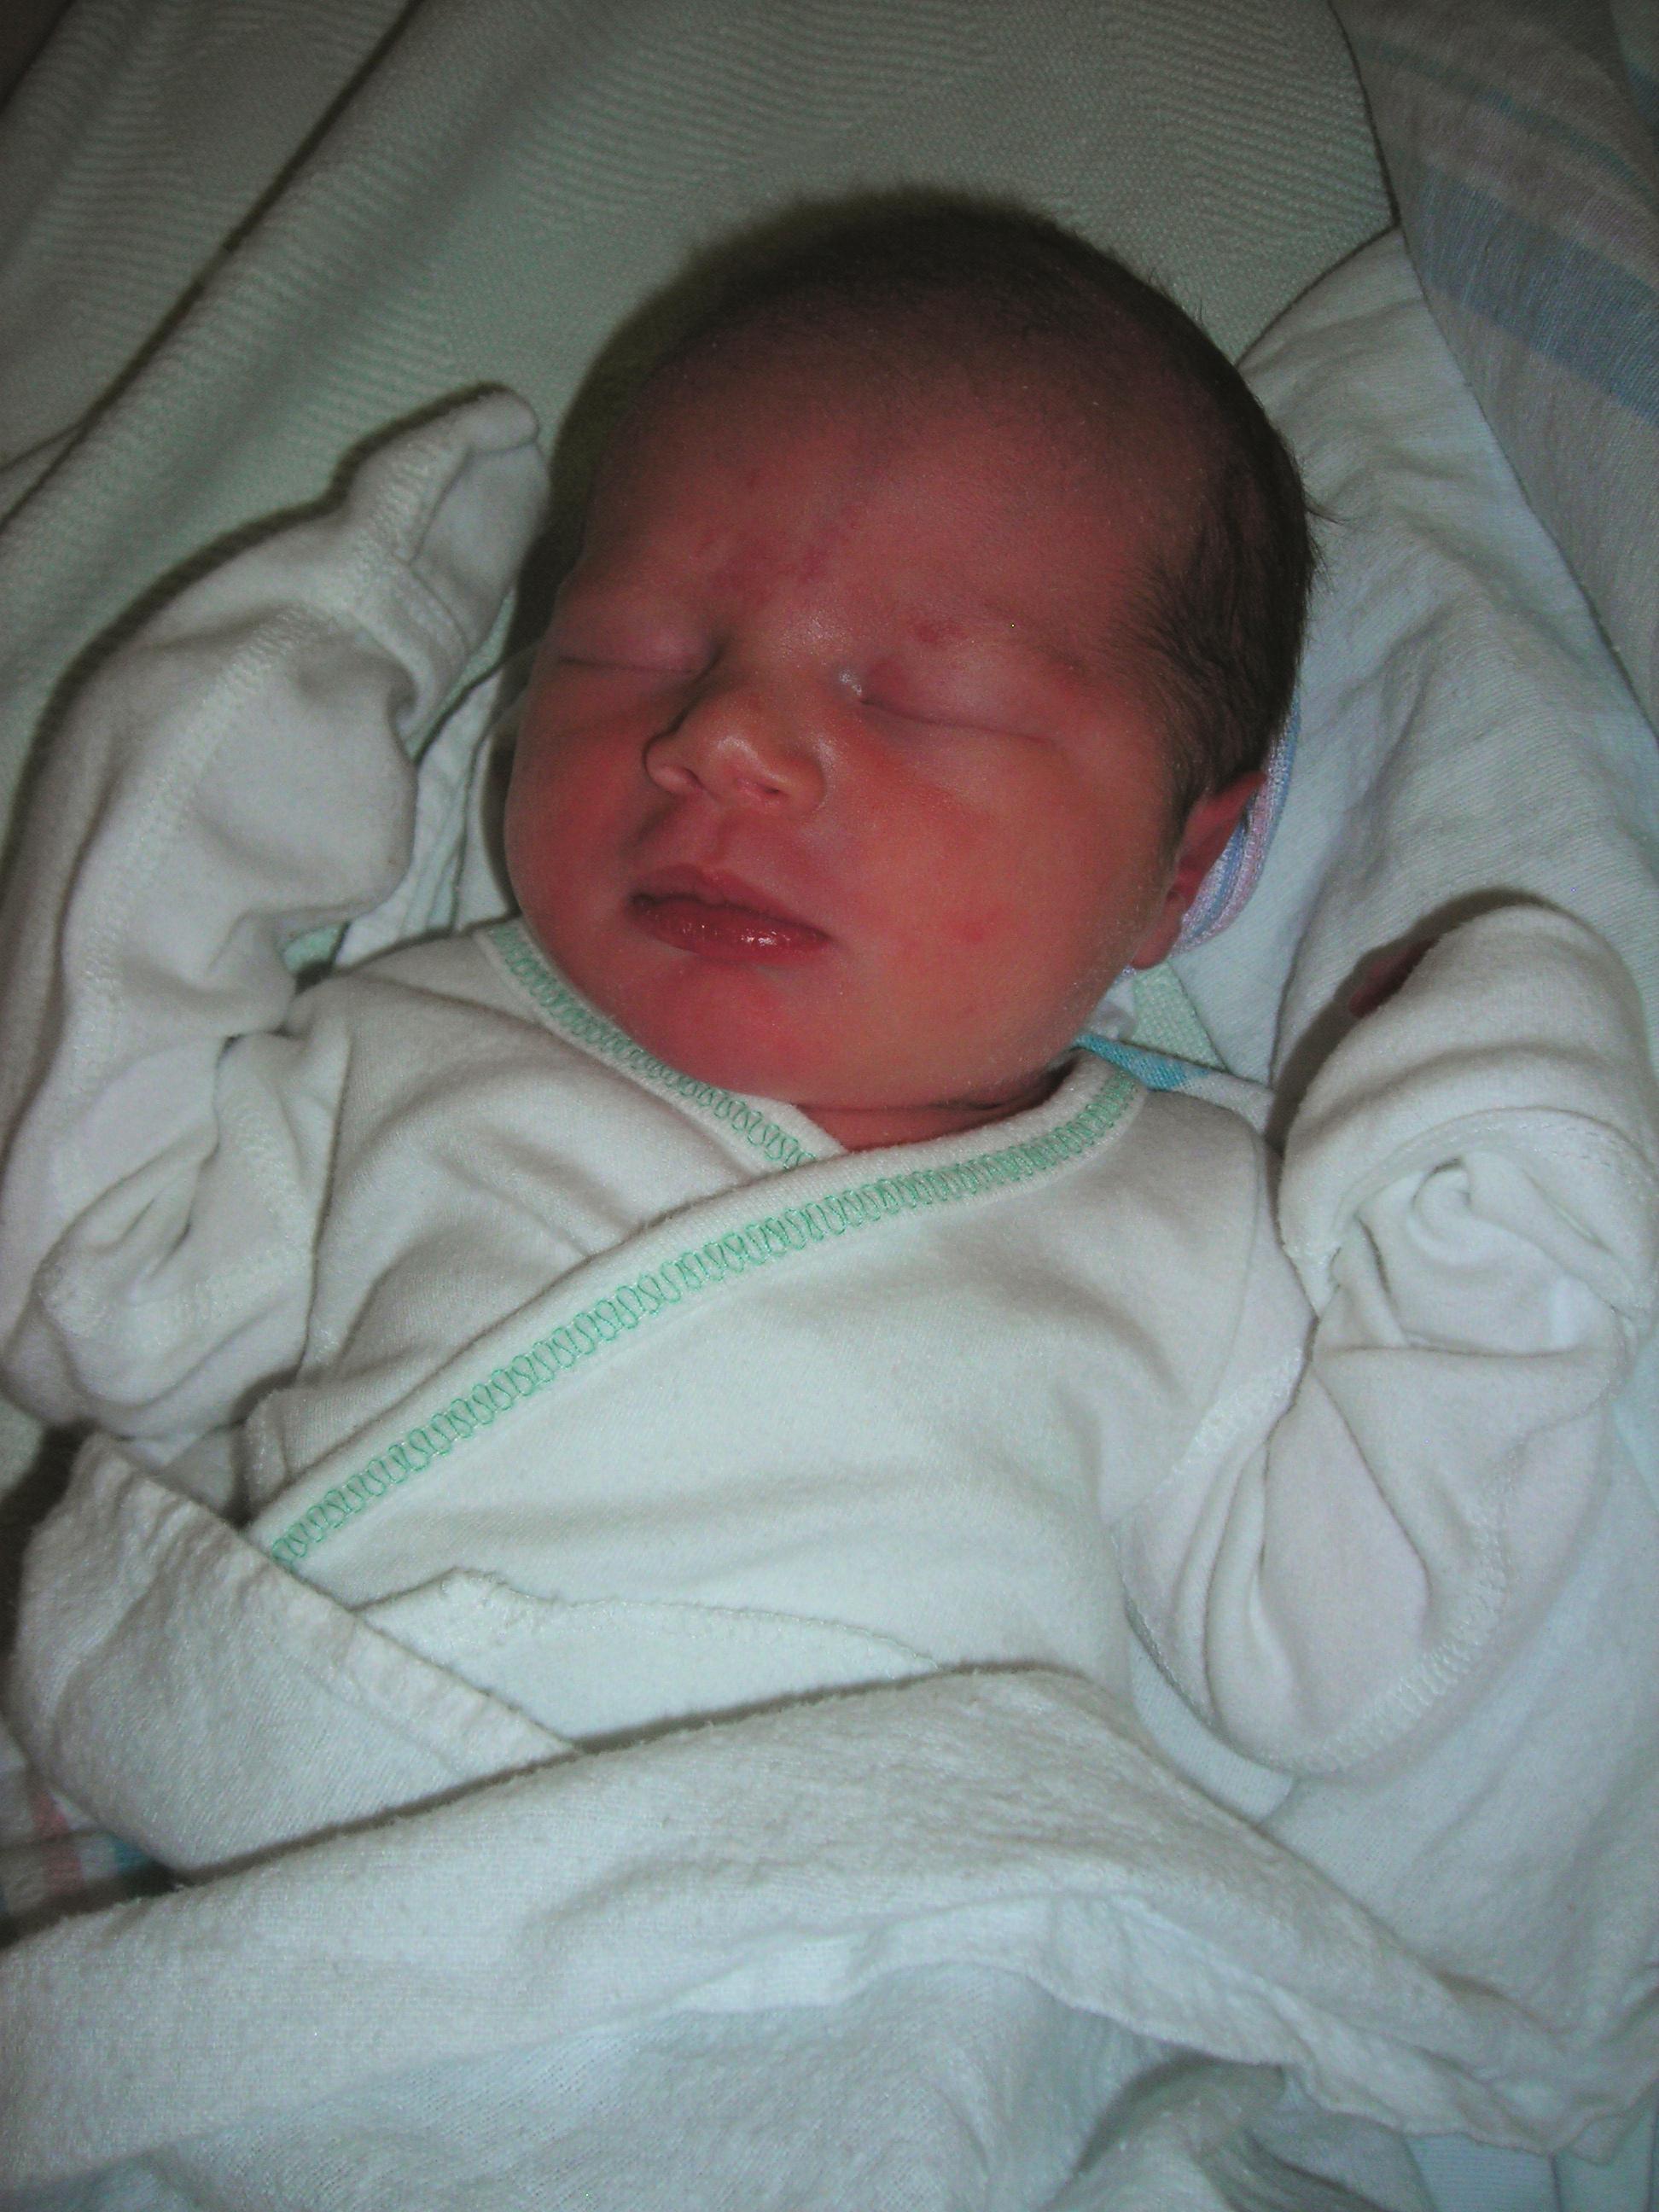 Madeleine Young Smedberg